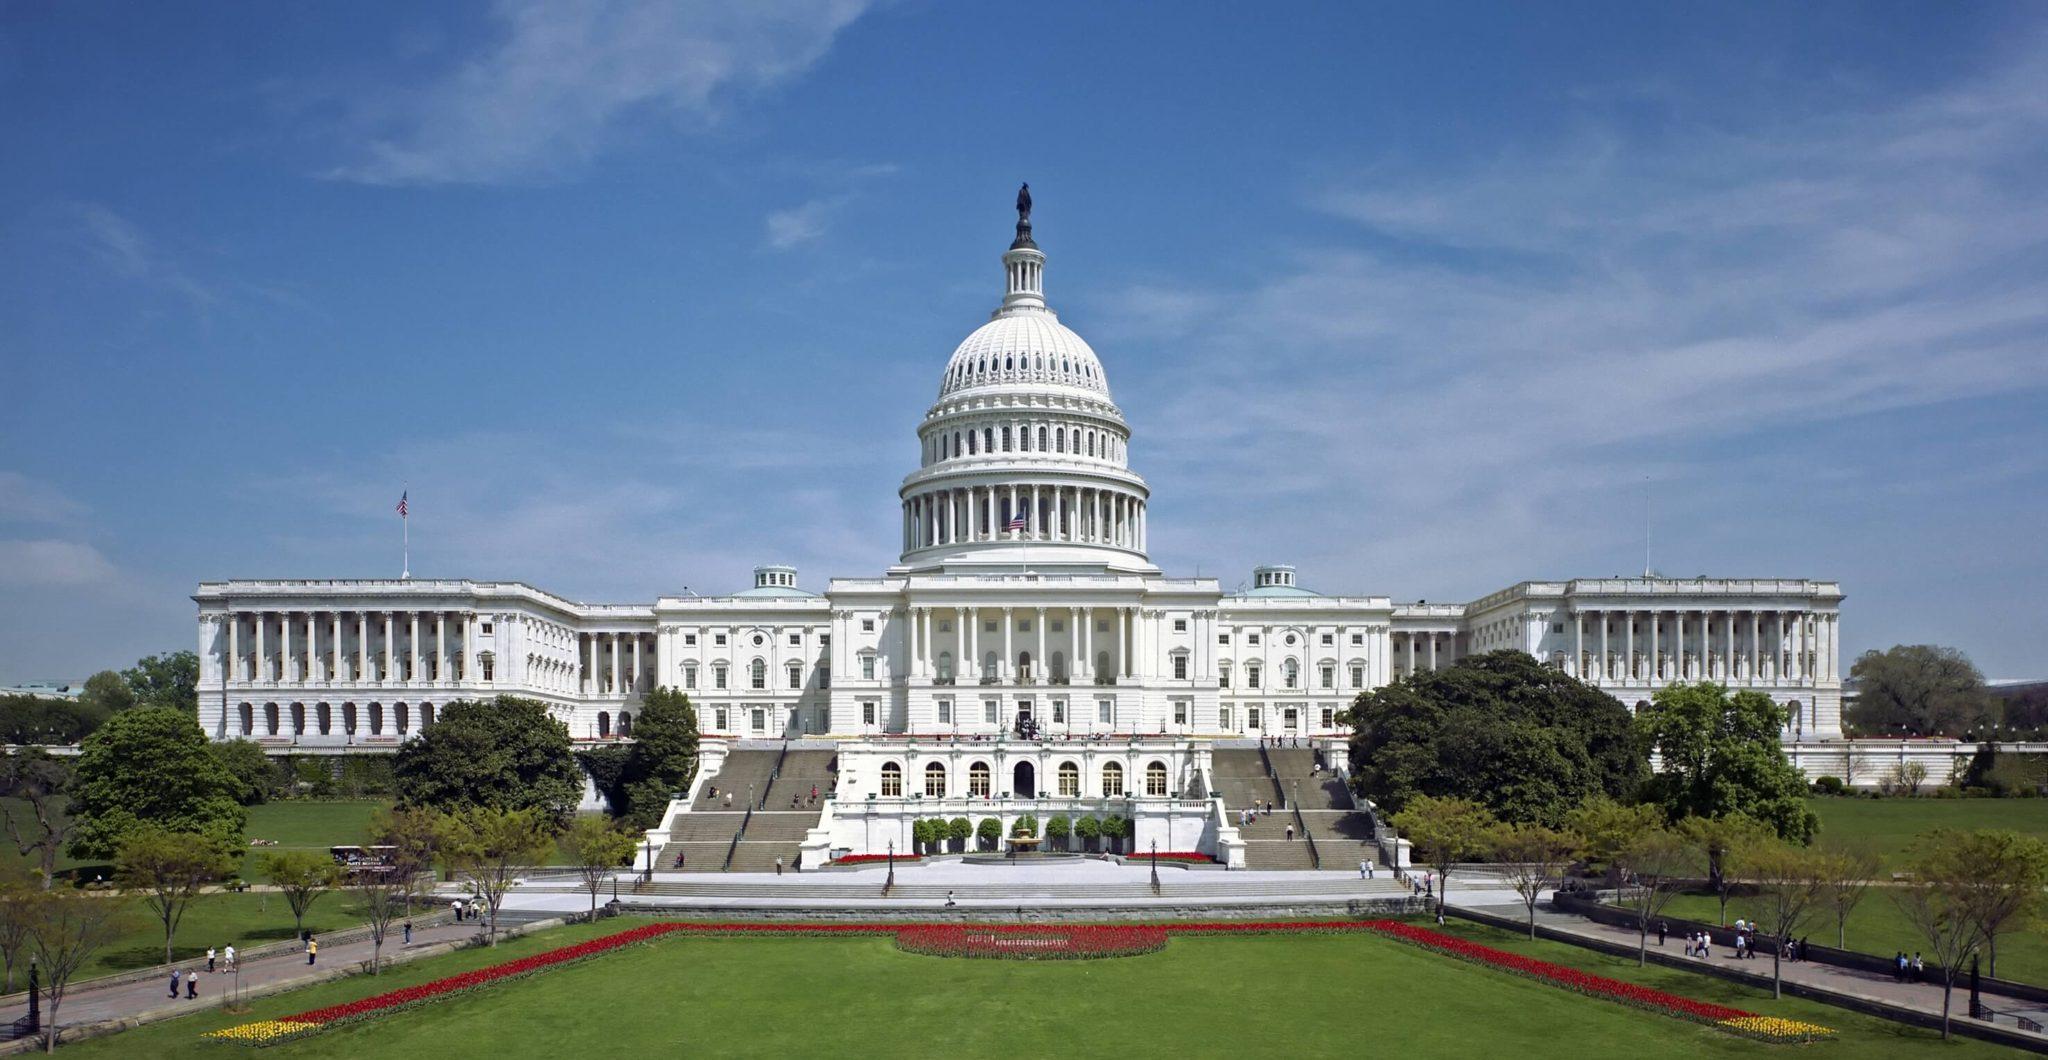 U.S. Congress Discusses AI, Automation, Robotics and Basic Income